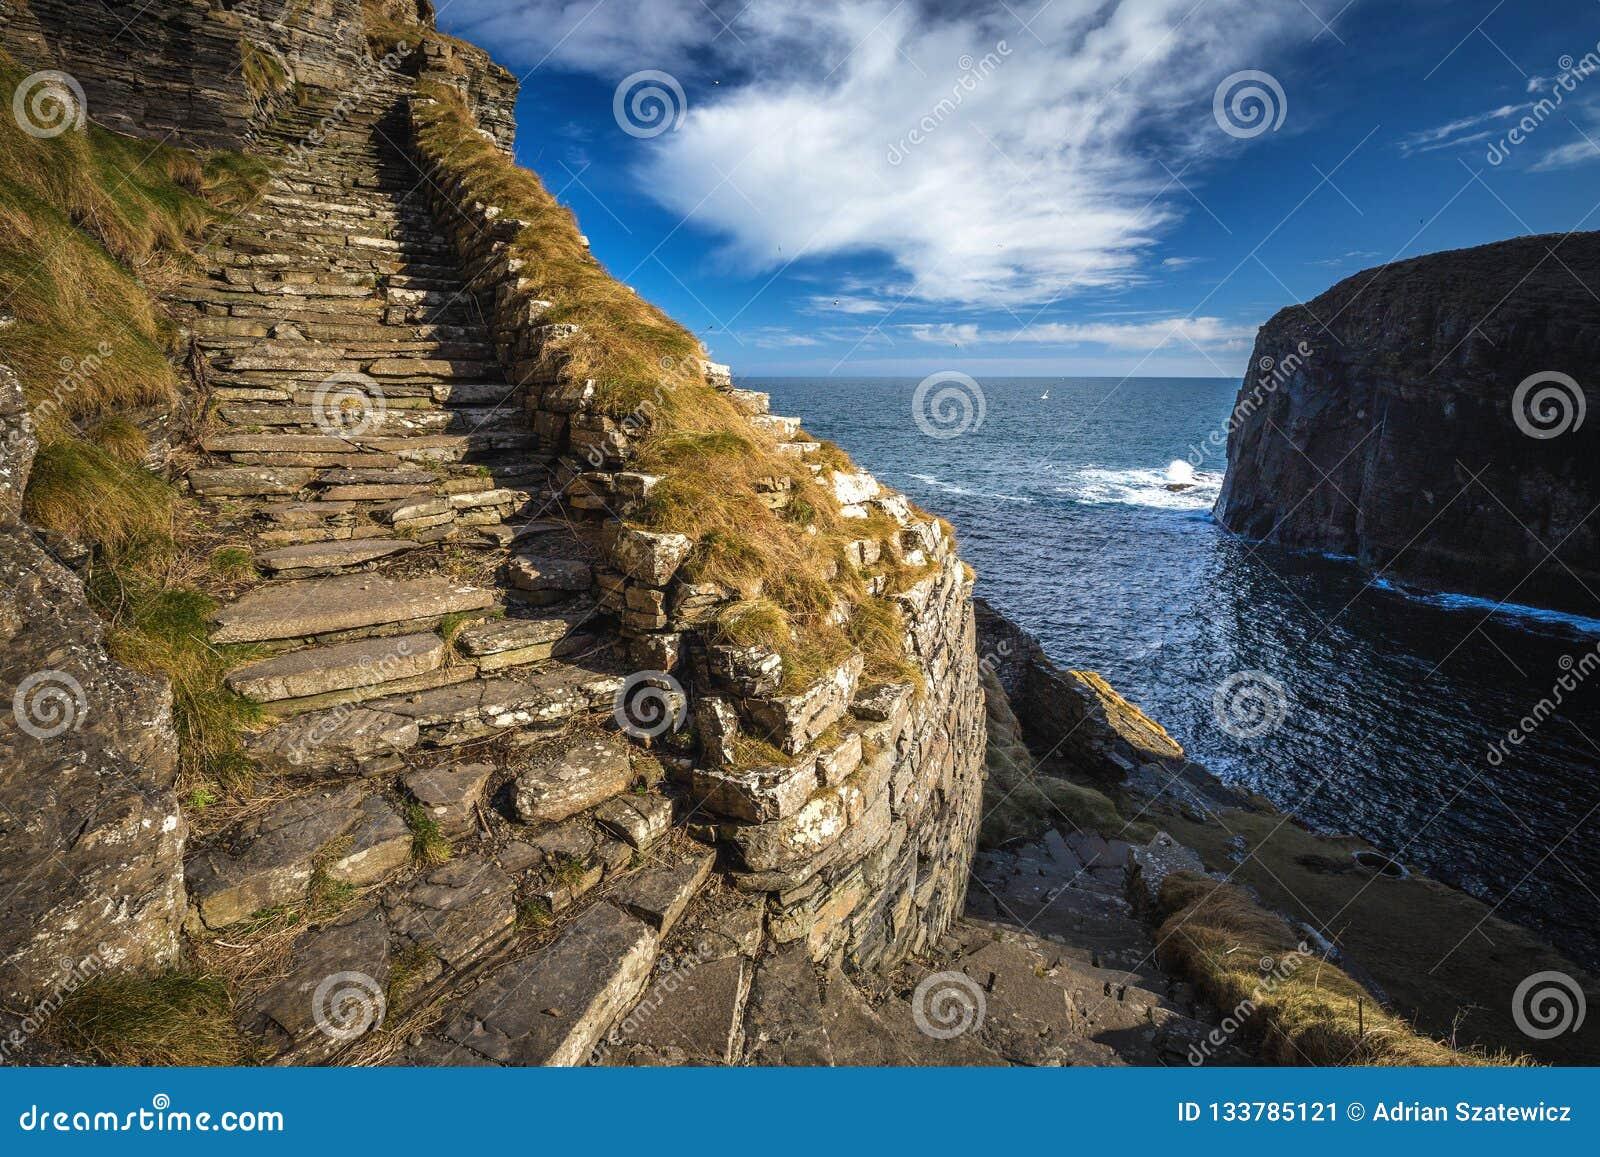 Whaligoe steps, Highlands of Scotland